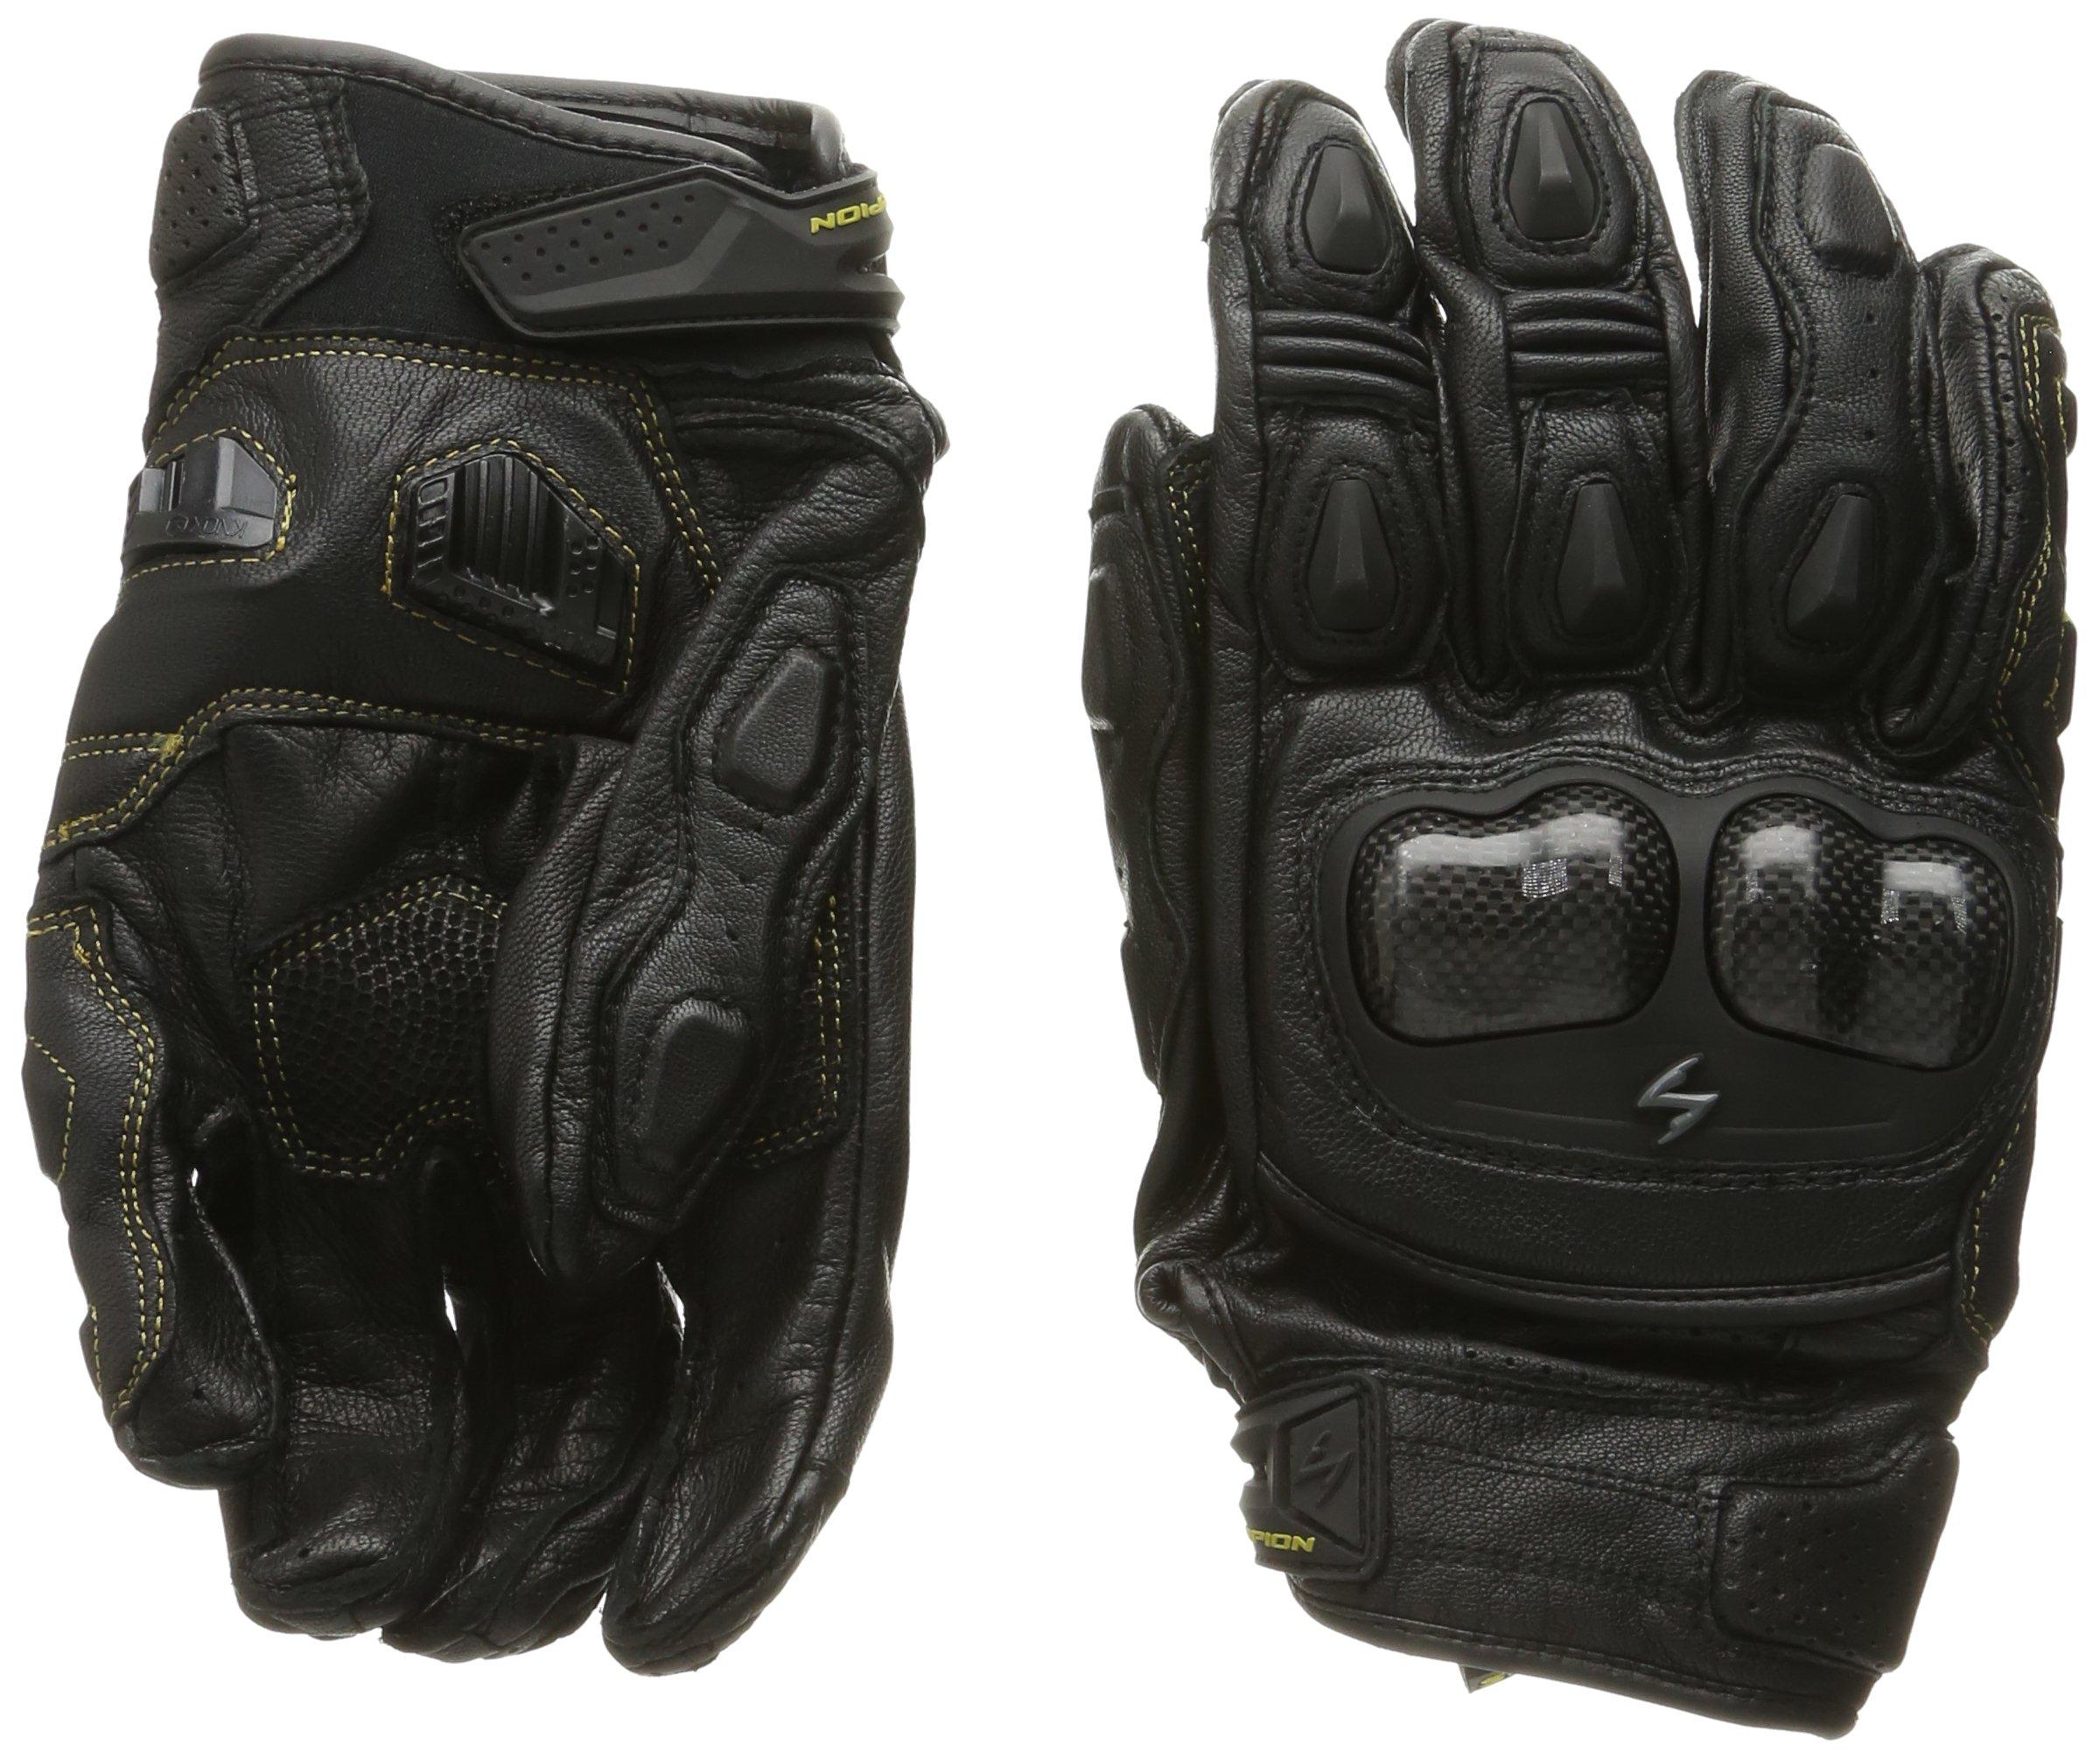 ScorpionExo SGS MKII Men's Short Cuff Sport Gloves (Black, Large)